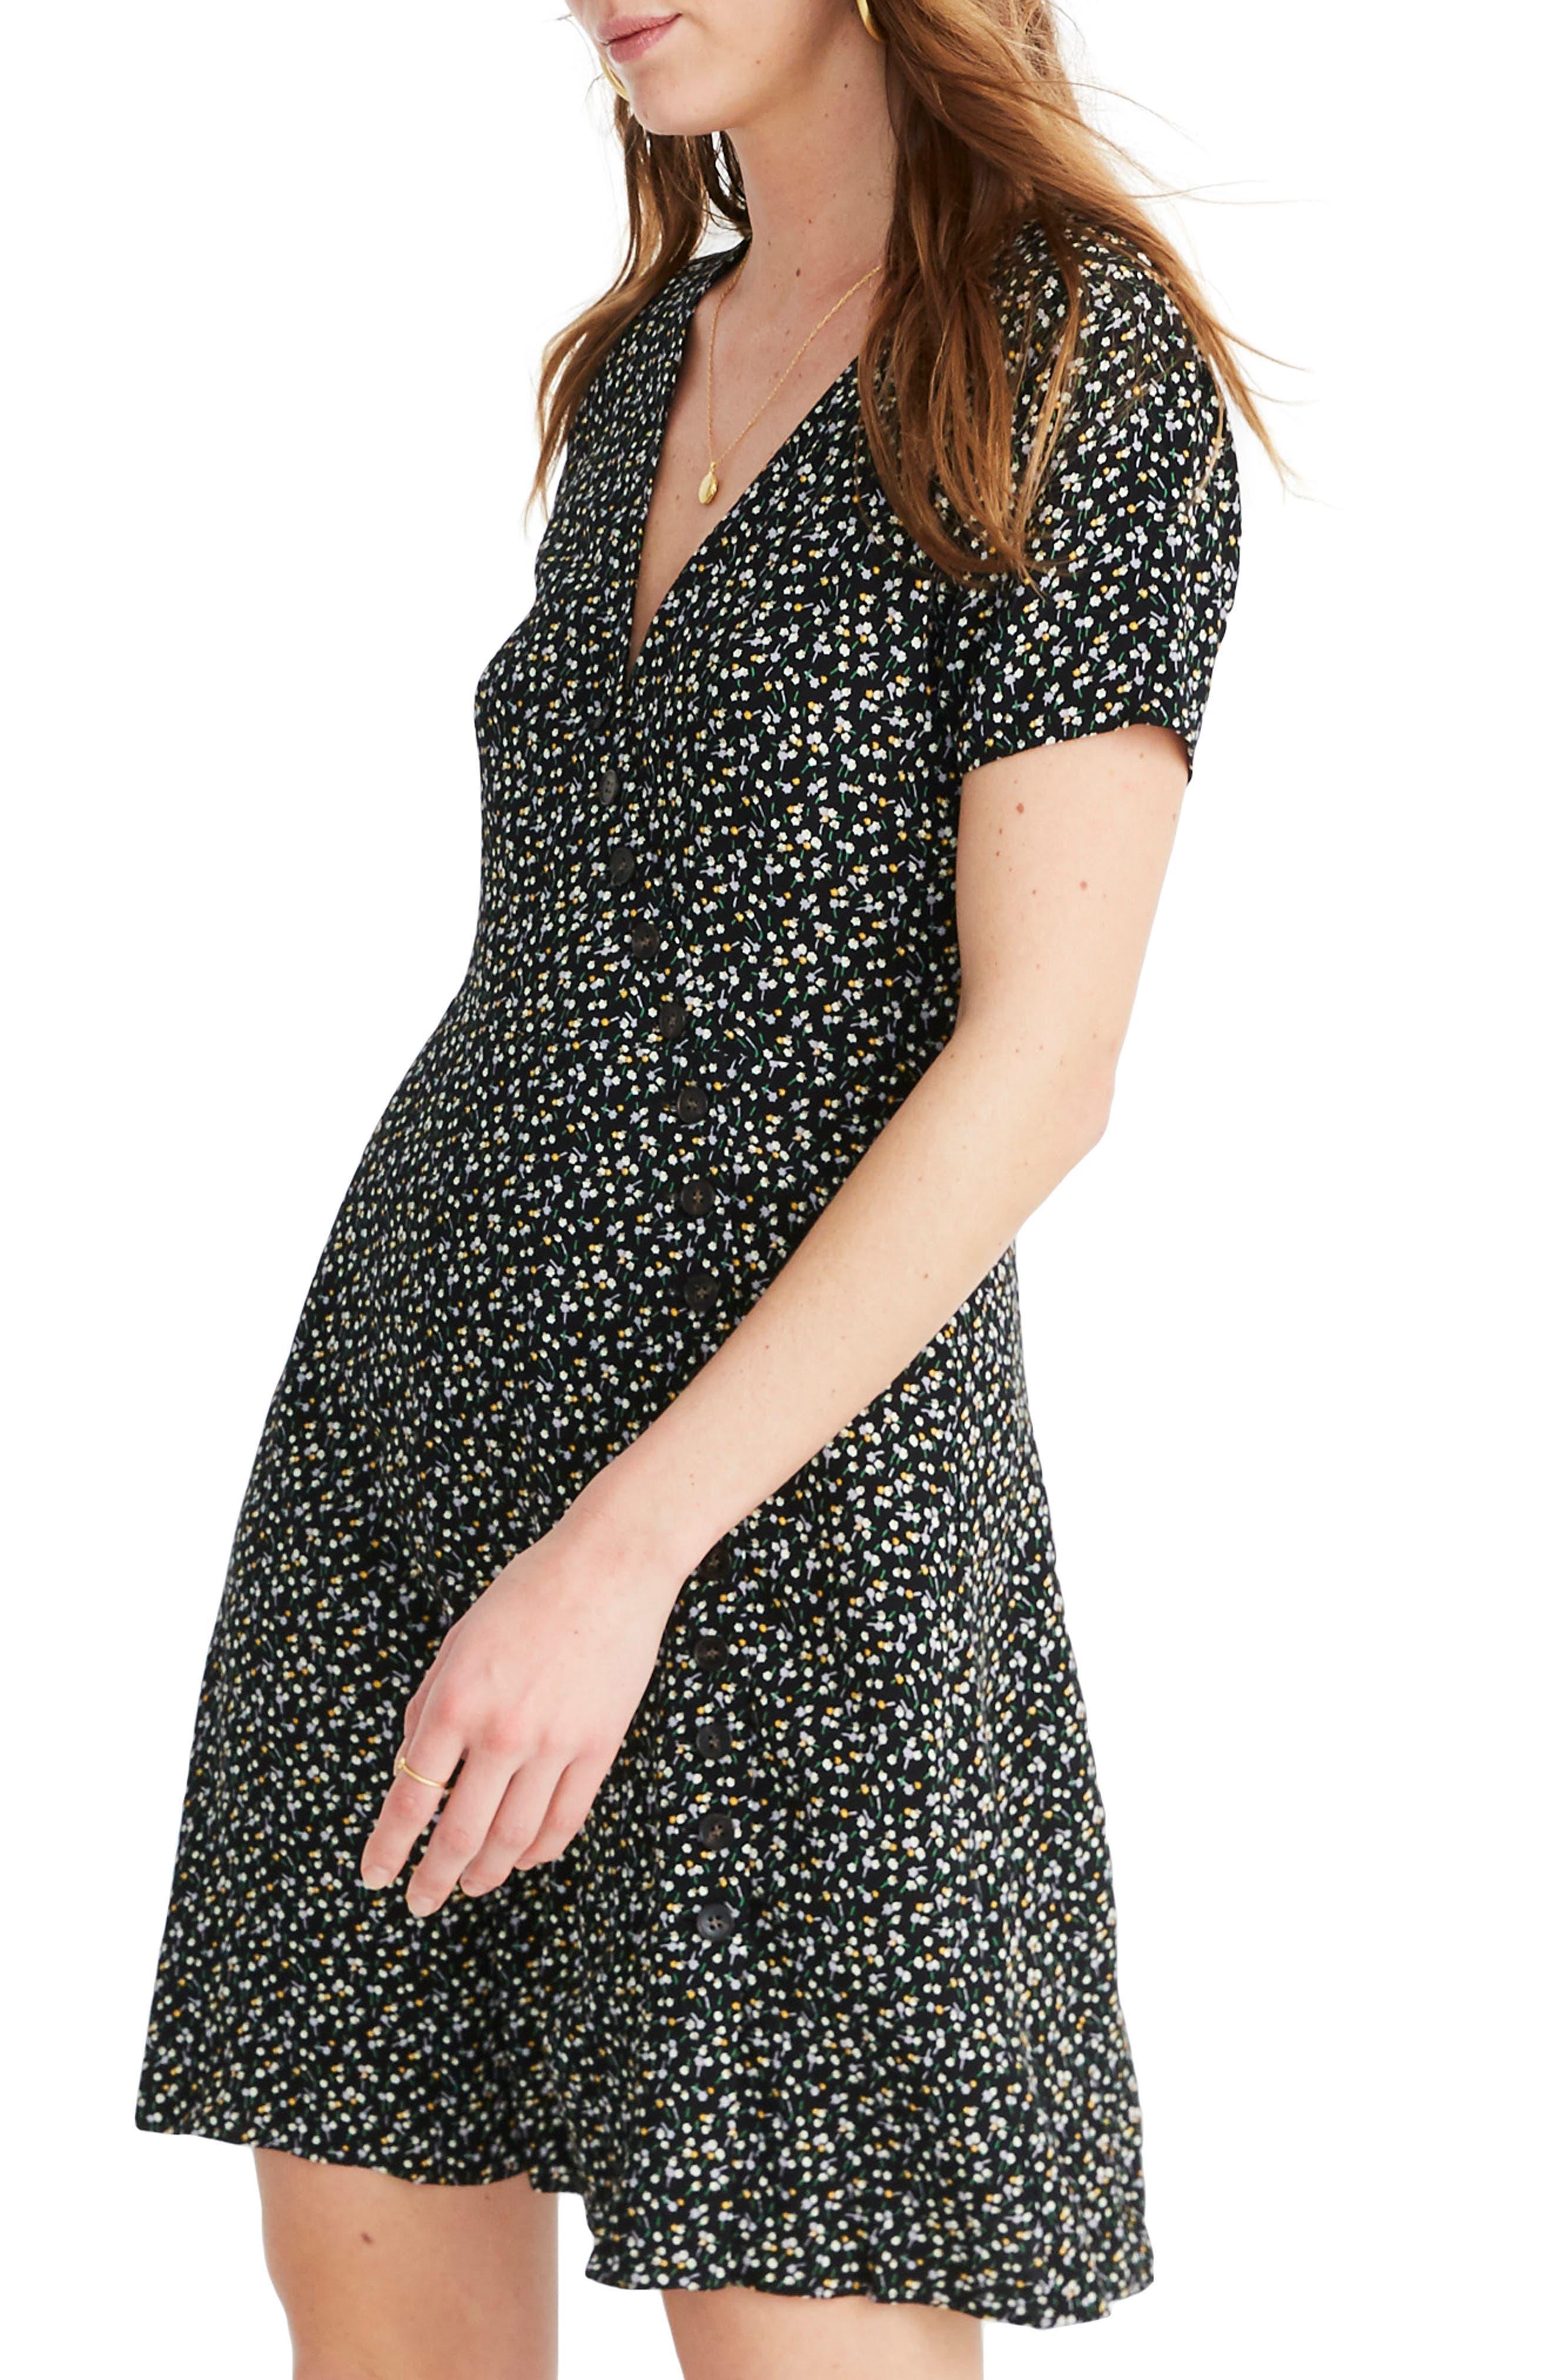 MADEWELL, Button Wrap Dress, Alternate thumbnail 3, color, BLACK FLORAL